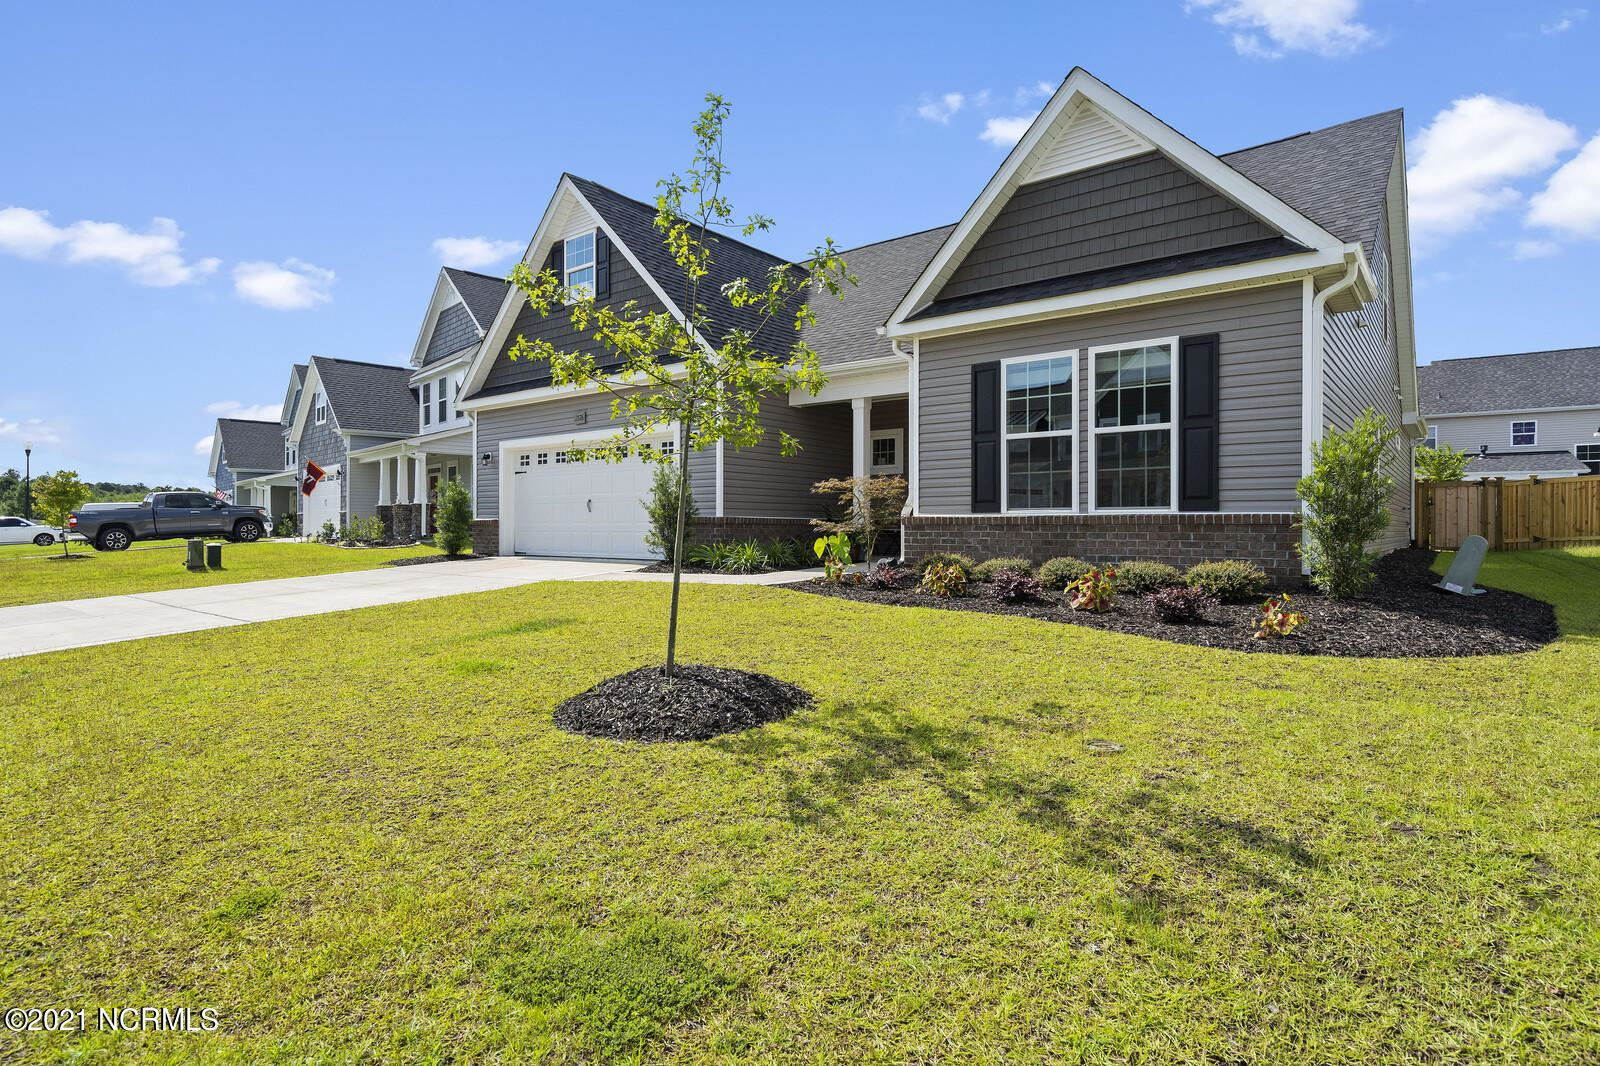 Photo of 1376 Goldengrove Lane, Wilmington, NC 28411 (MLS # 100285638)